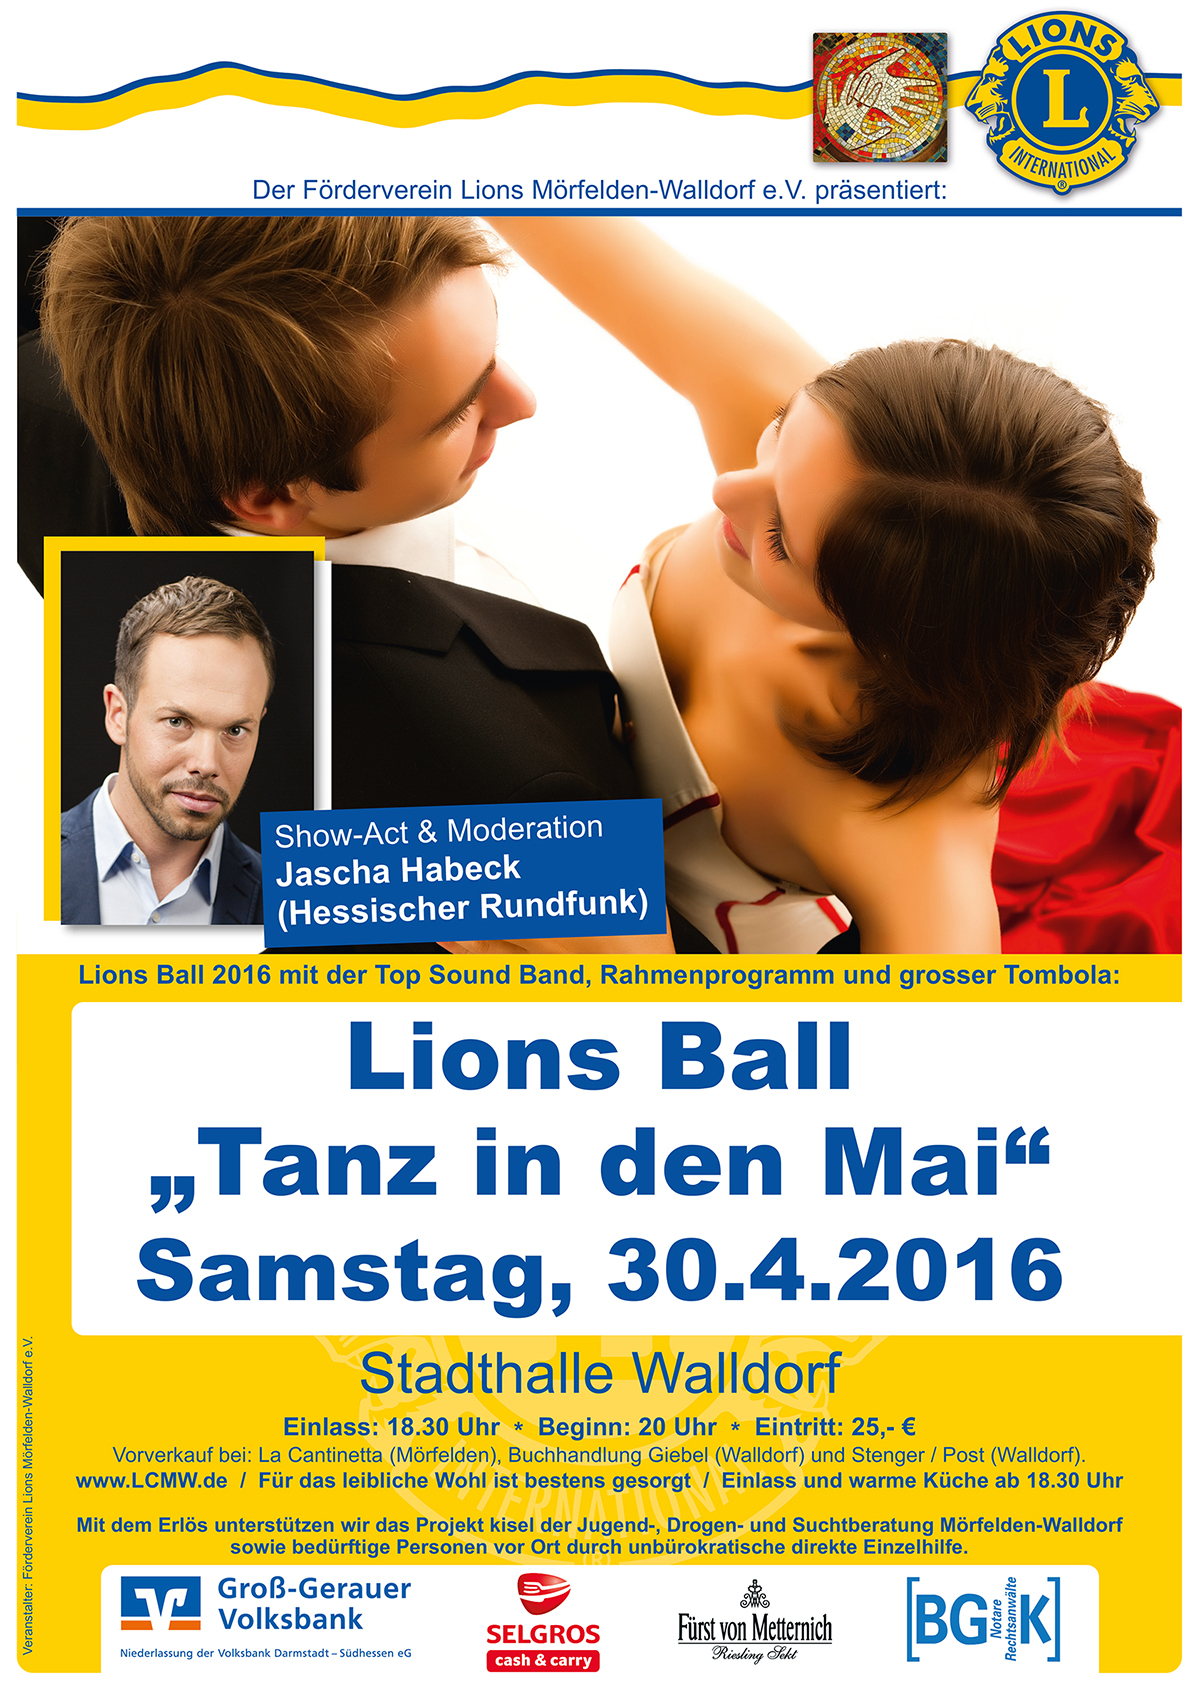 Lions-TanzMai-webPoster16